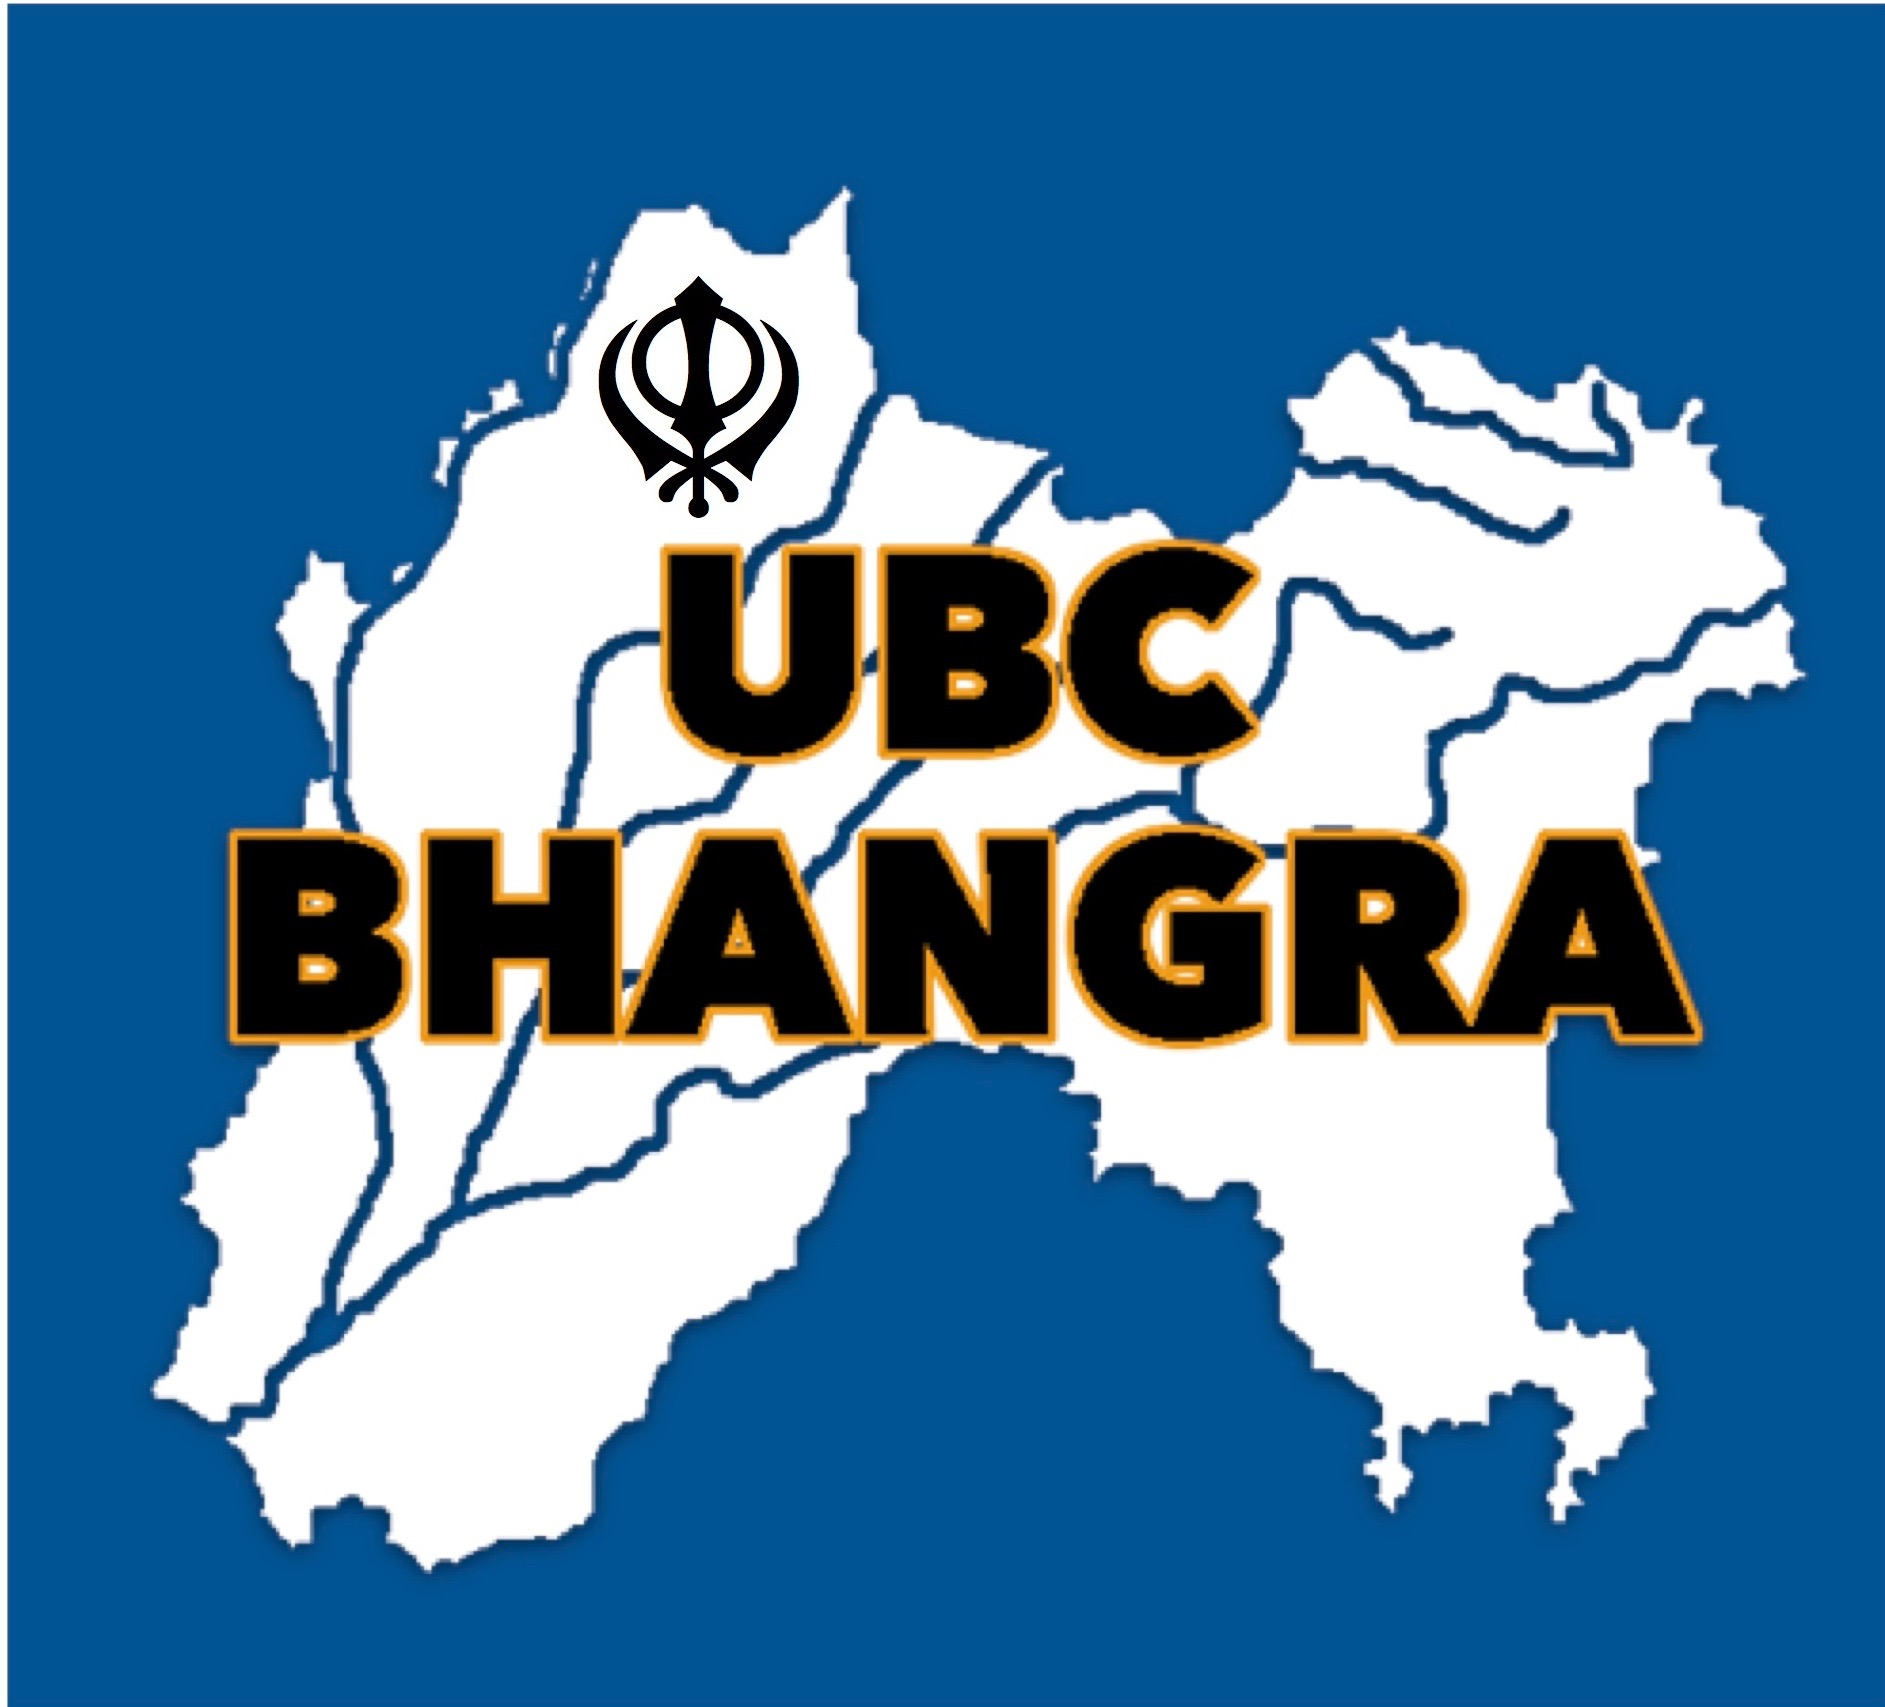 UBC_Bhangra_Logo_v2_2.jpg